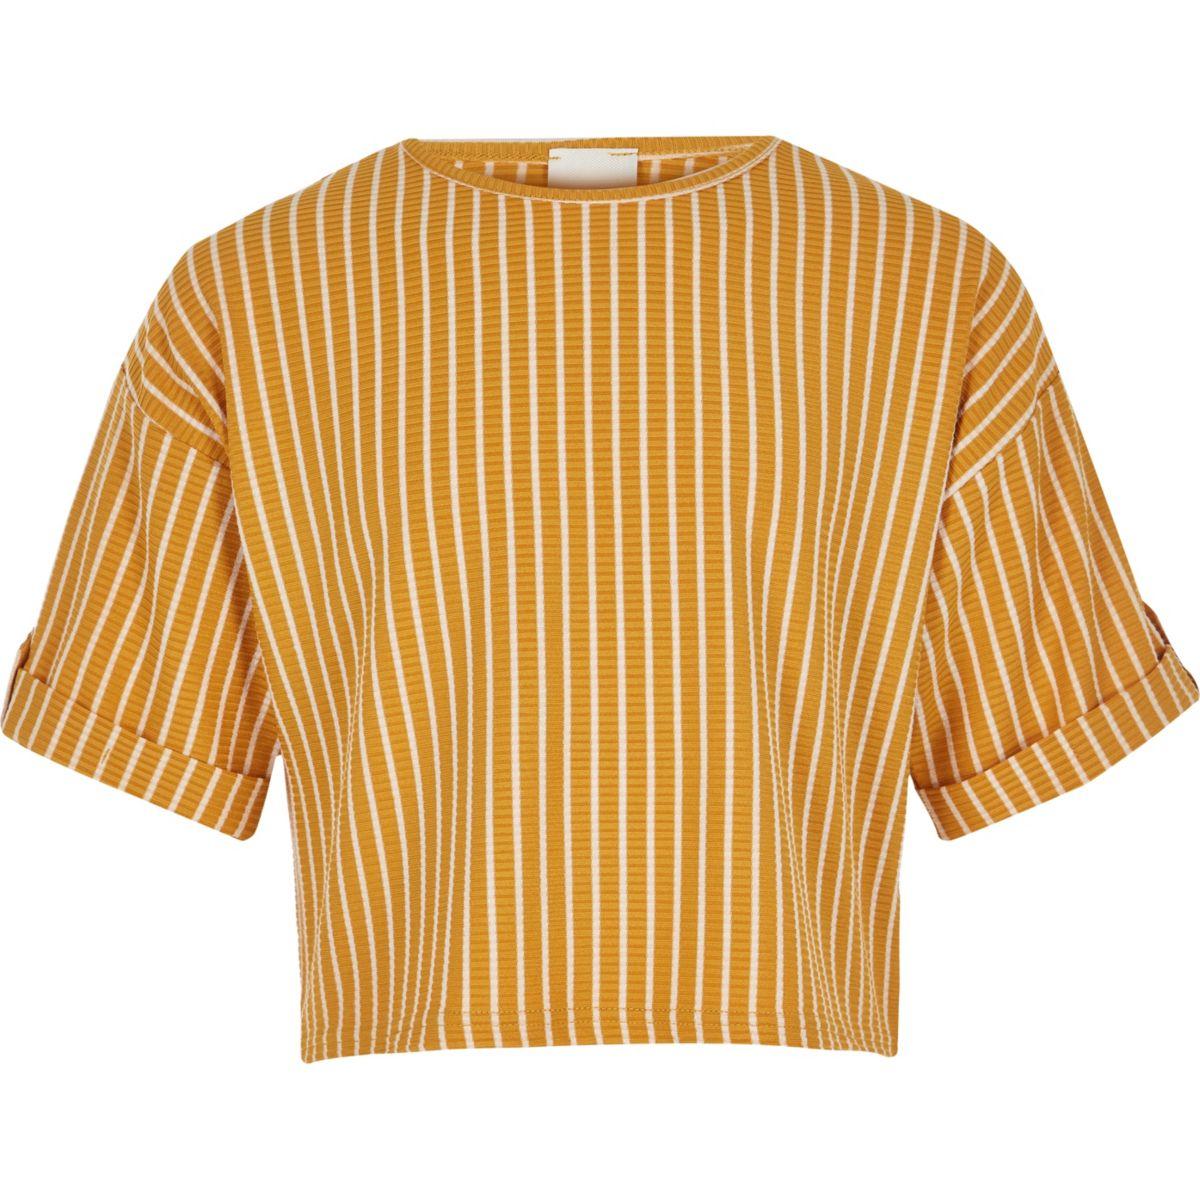 Girls yellow stripe T-shirt